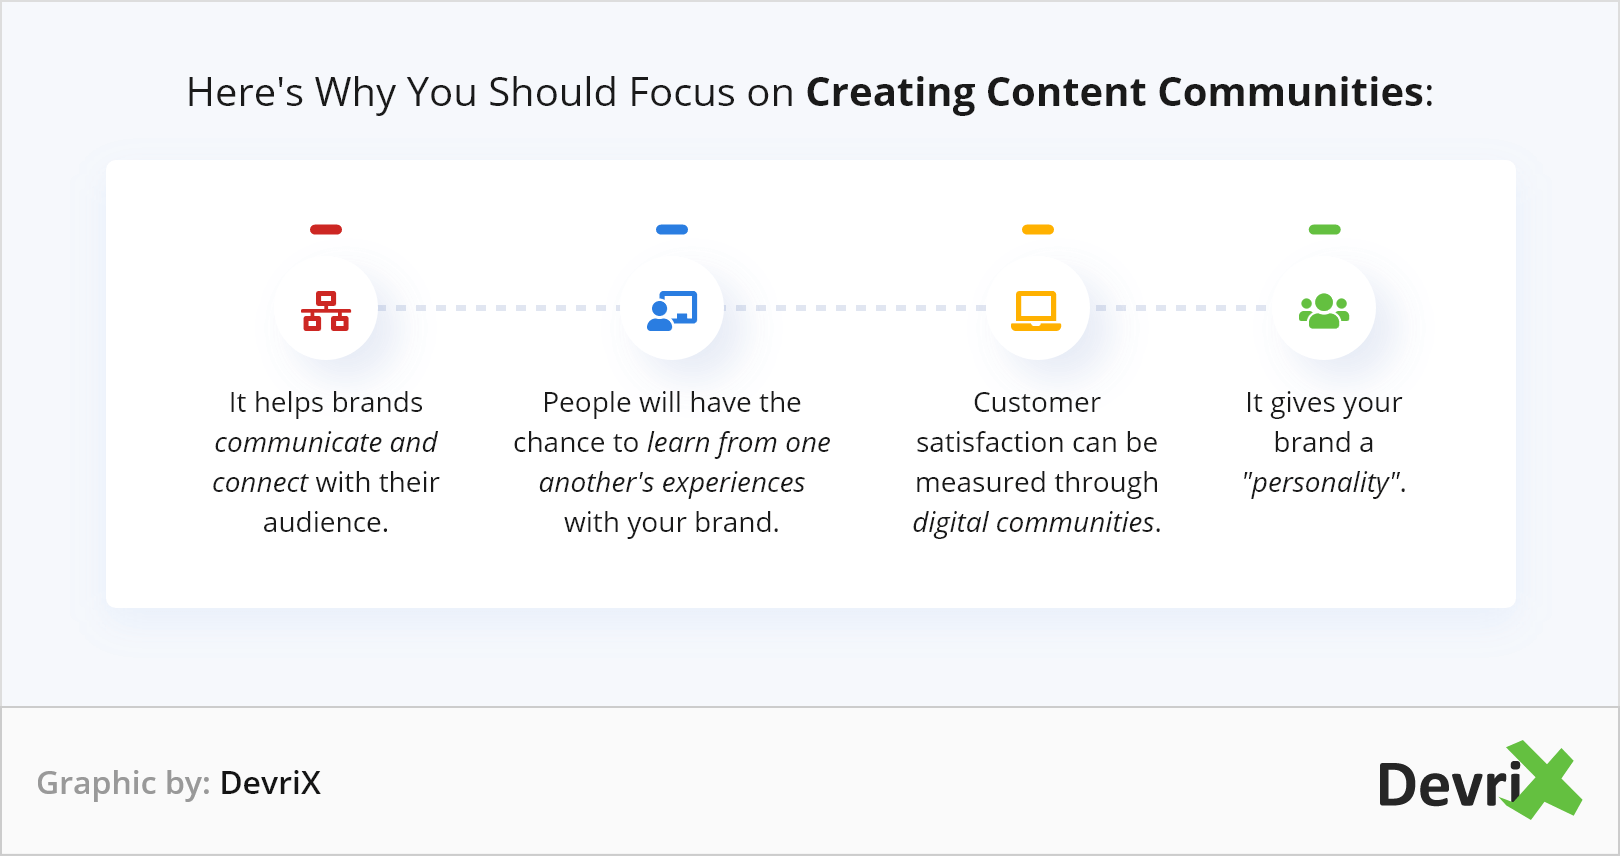 Creating Content Communities